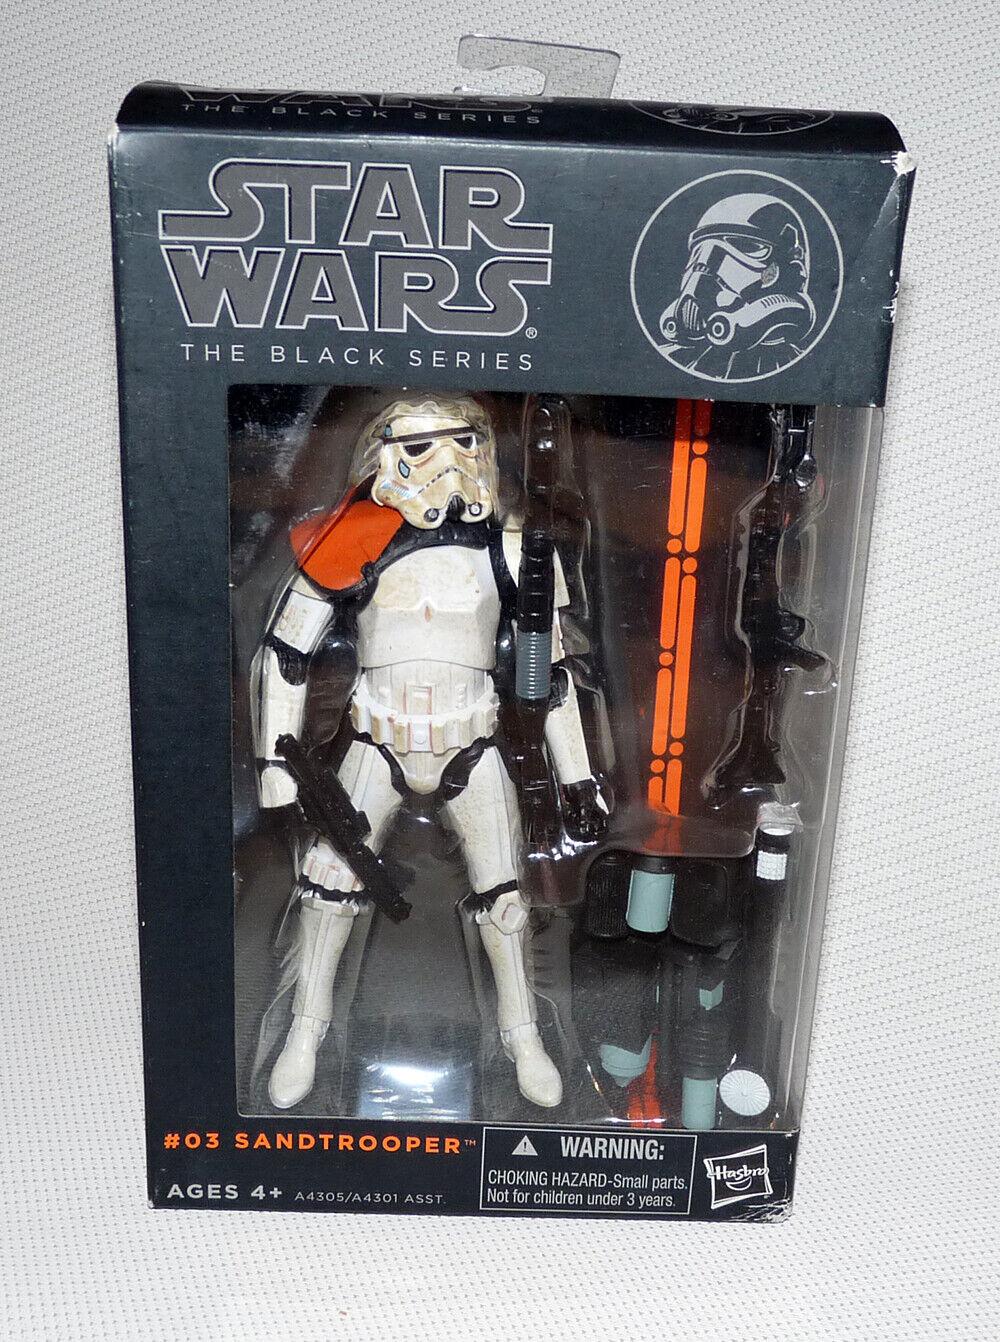 Hasbro Hasbro Hasbro Star Wars Series 1 Sandtrooper Action Figure e6df1b